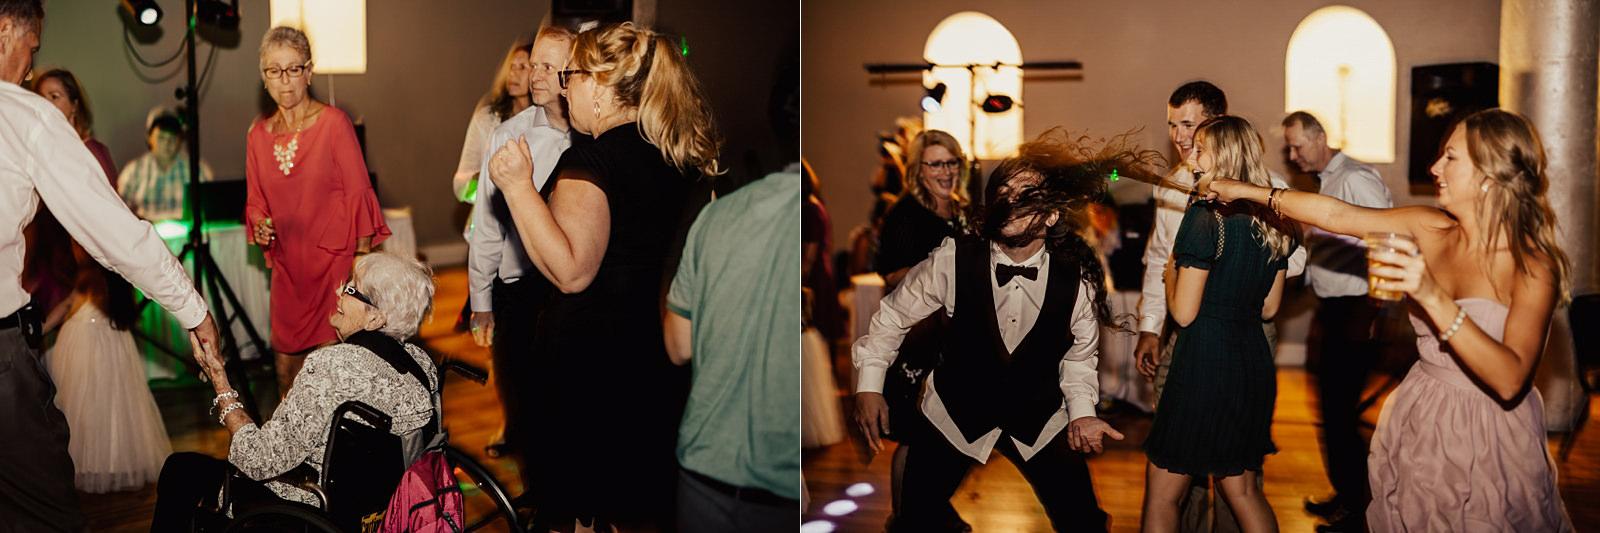 Molly & Bradley Modern Boho Wedding at The University Club Quad Cities-54.jpg